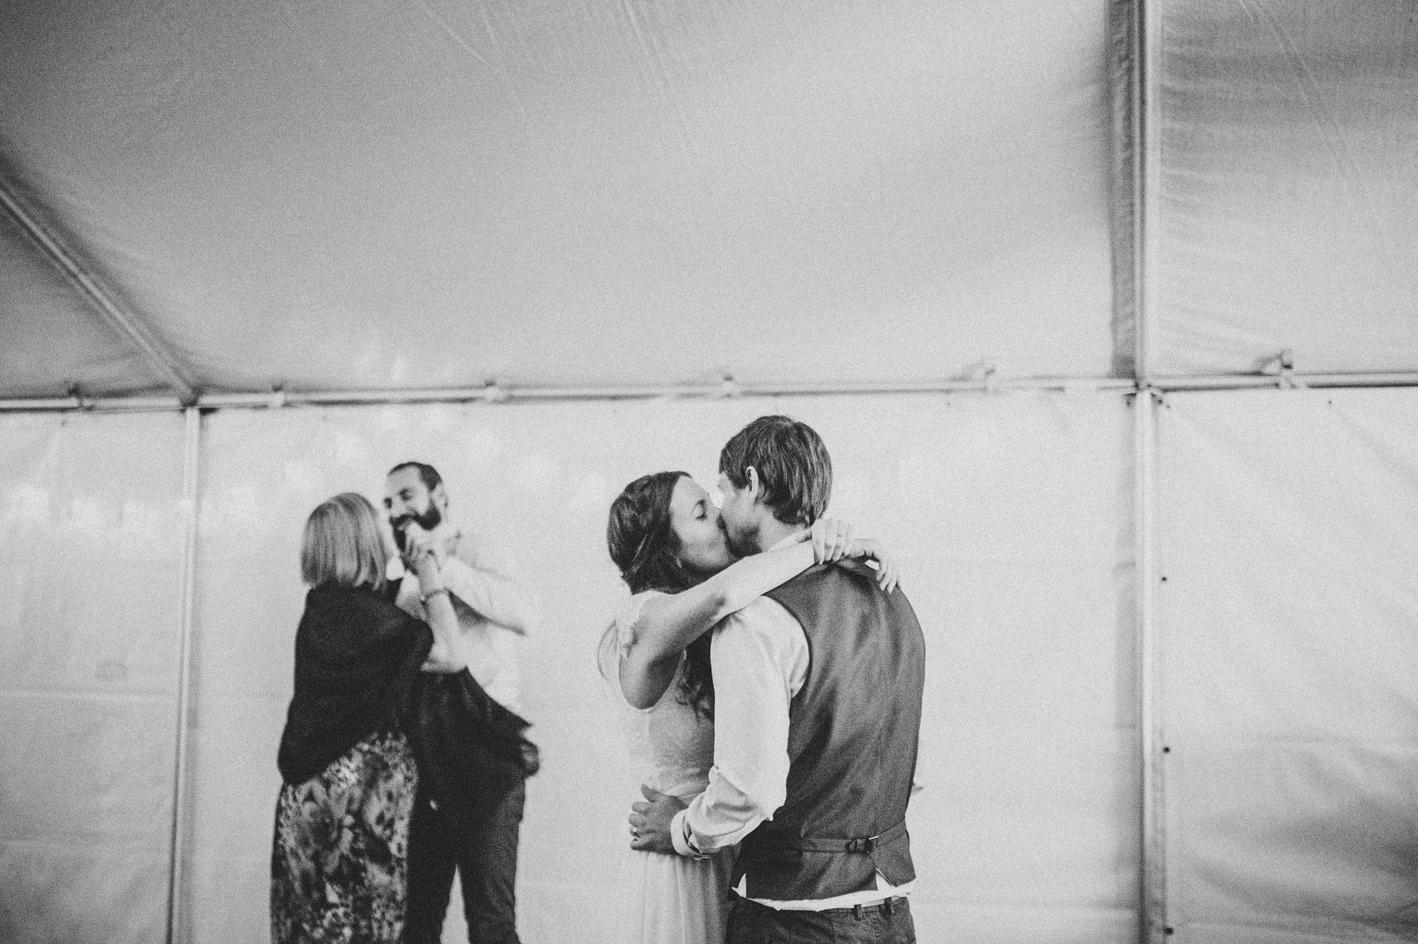 086-michelle-reagan-mount-tamborine-wedding-sophie-baker-photography